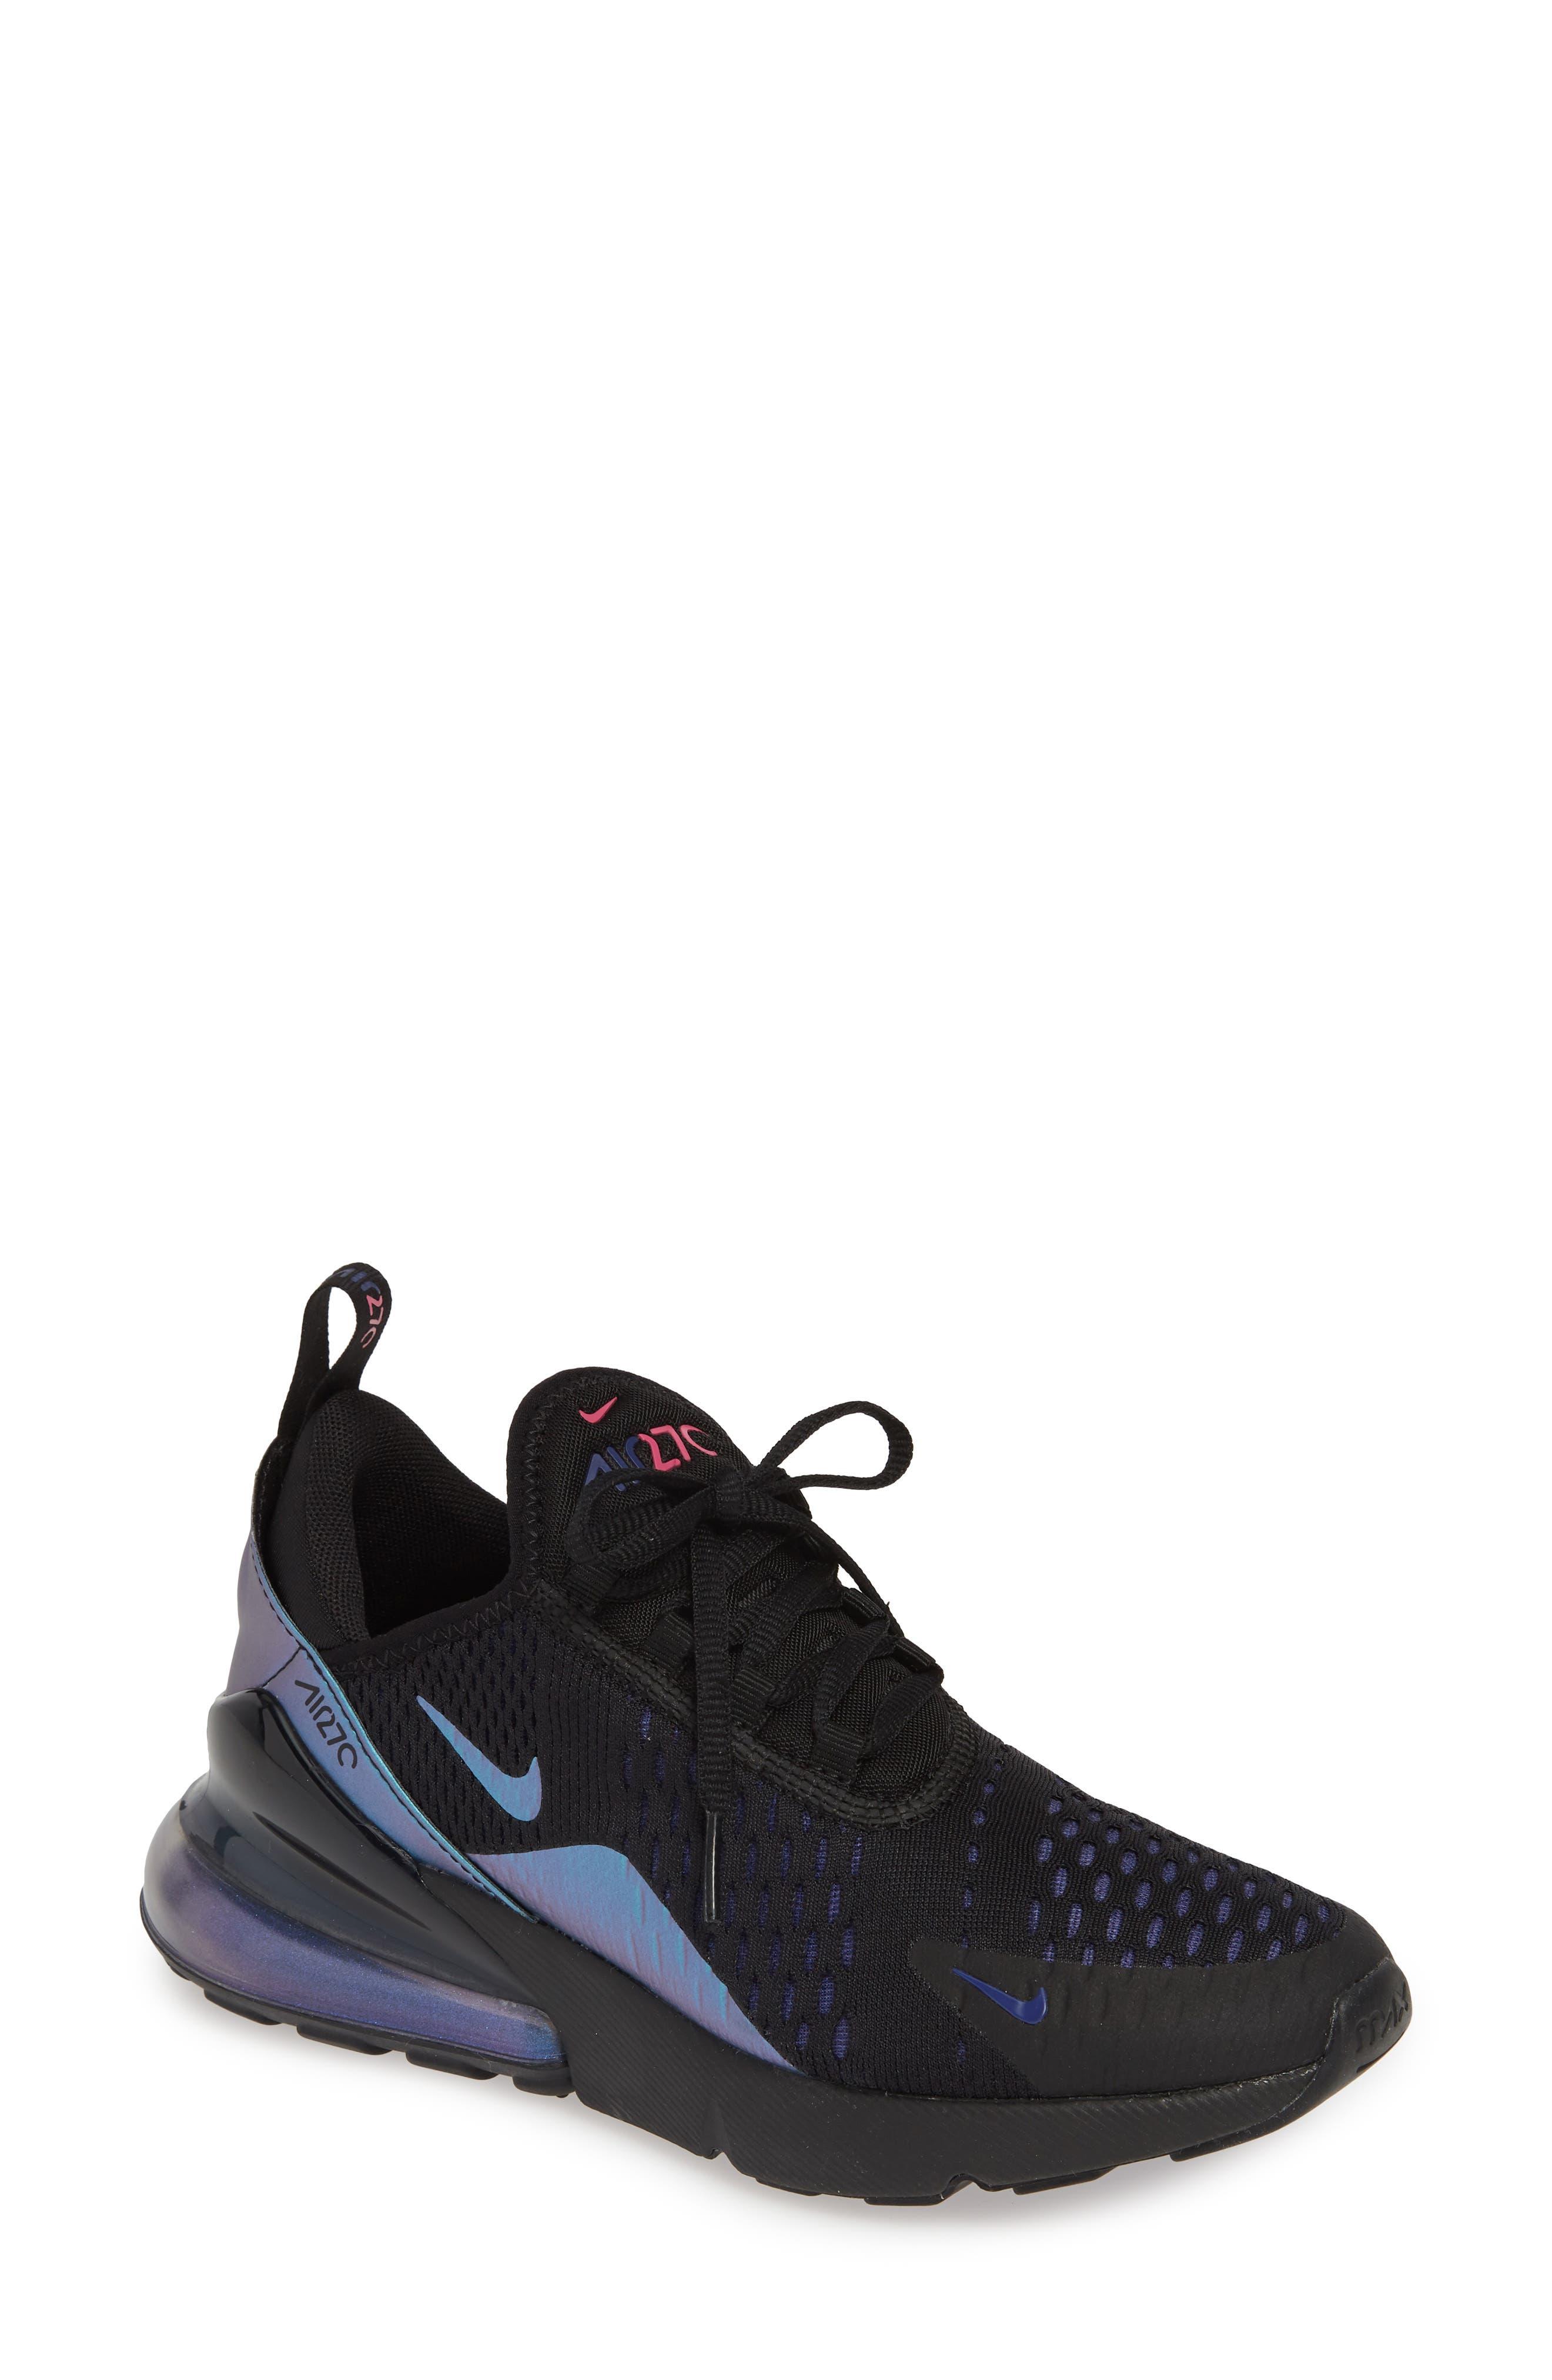 NIKE Air Max 270 Premium Sneaker, Main, color, BLACK/ FUCHSIA/ PURPLE